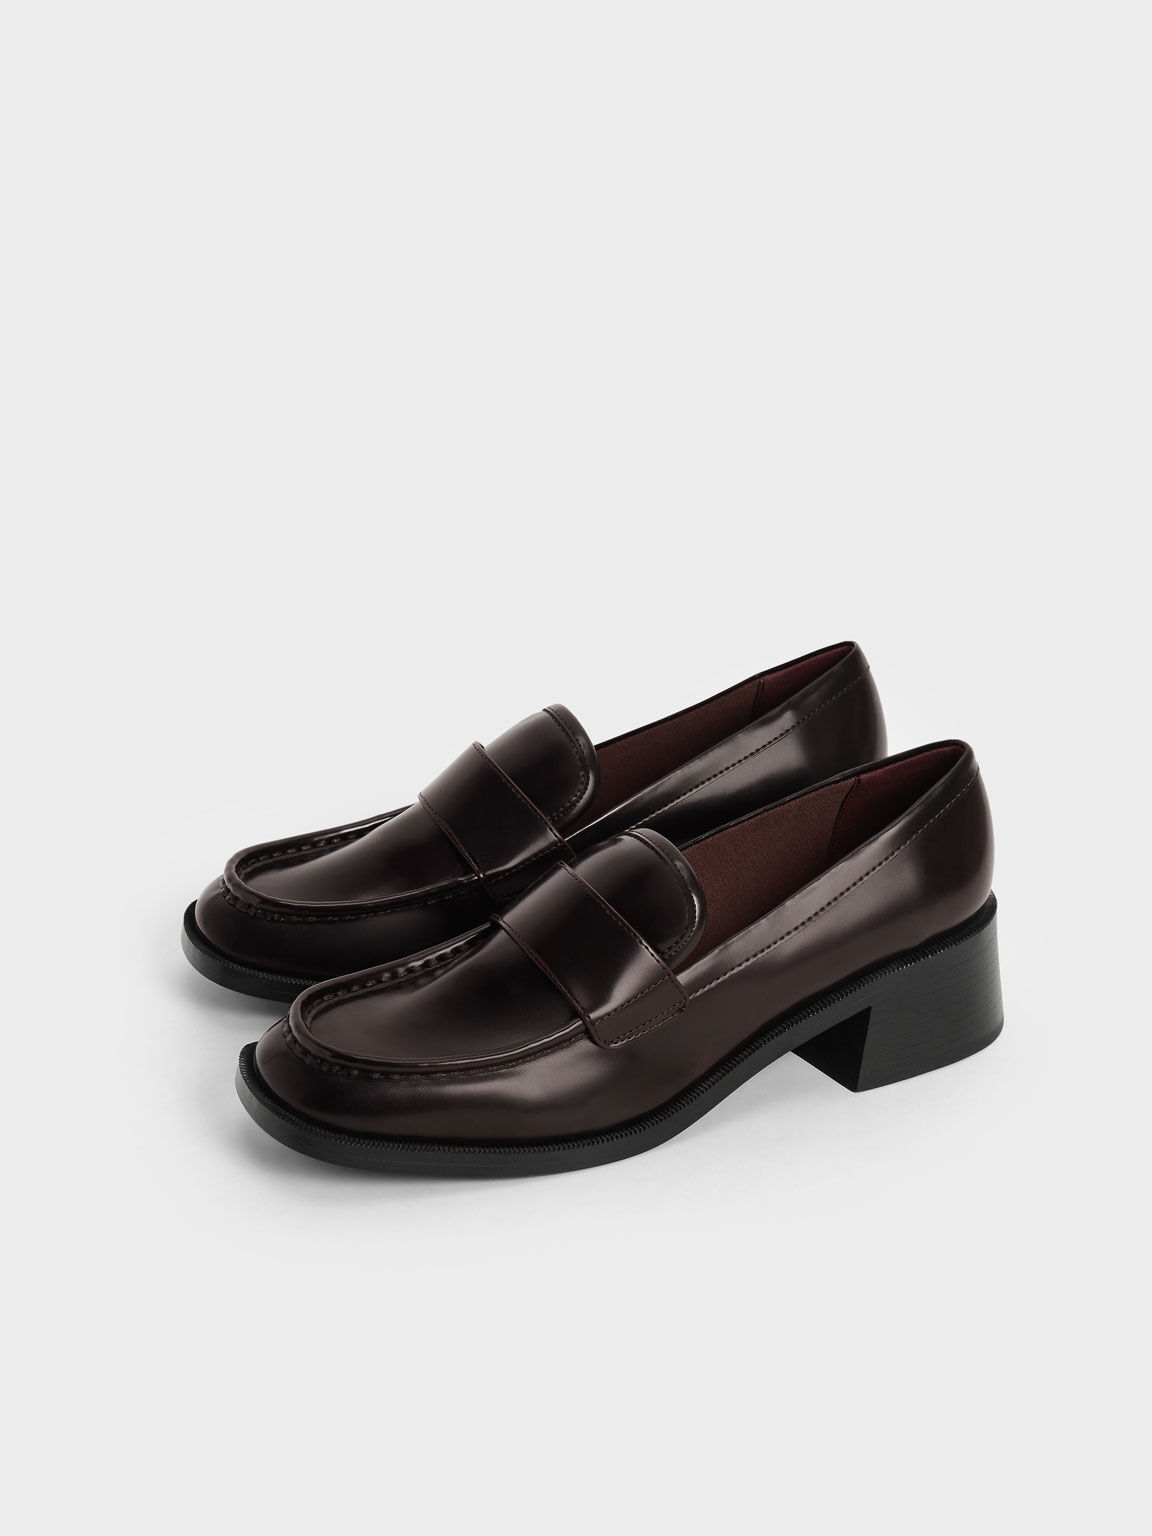 Block Heel Penny Loafers, Burgundy, hi-res